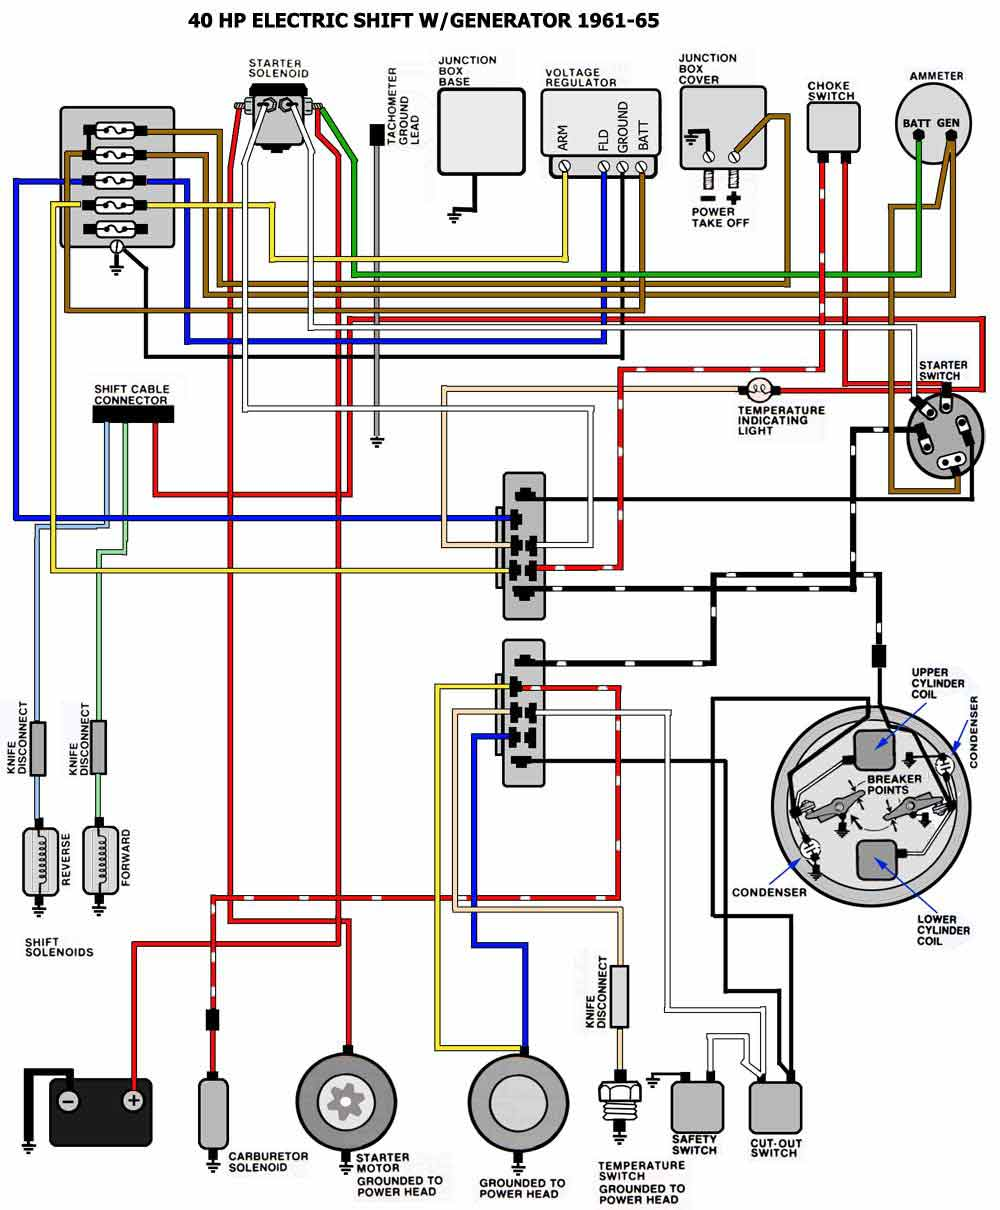 Surprising Evinrude Outboard Motors Wiring Diagrams Diagram Data Schema Wiring Cloud Eachirenstrafr09Org